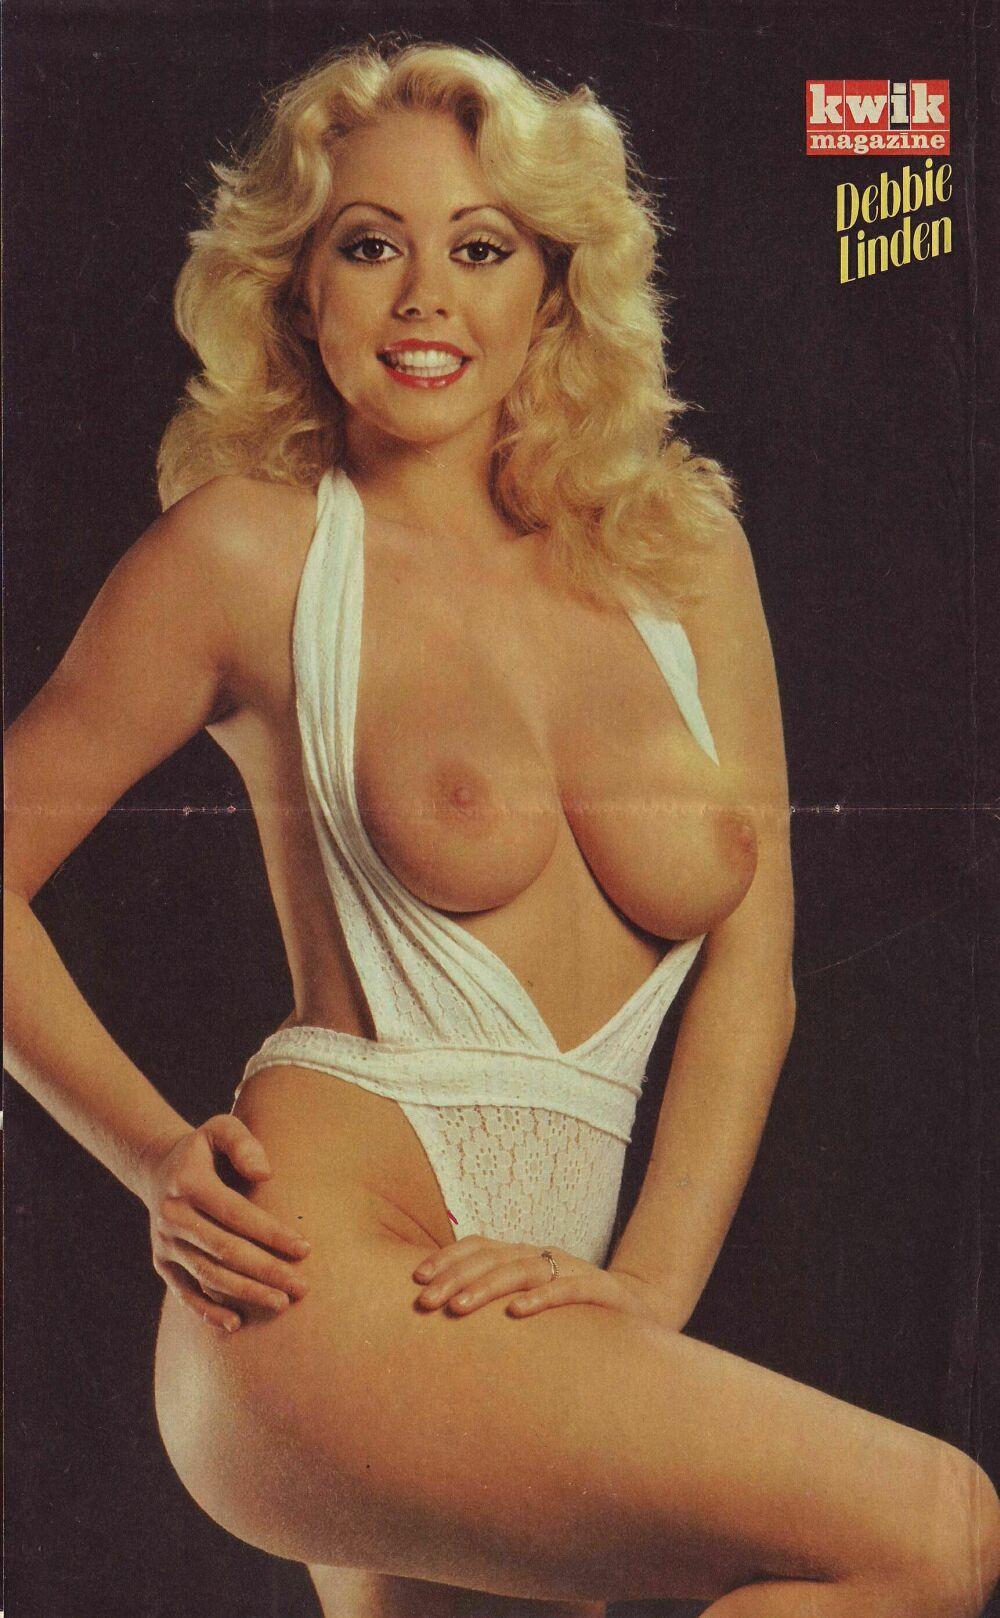 Porno Debbie Linden naked (69 photos) Video, 2020, in bikini